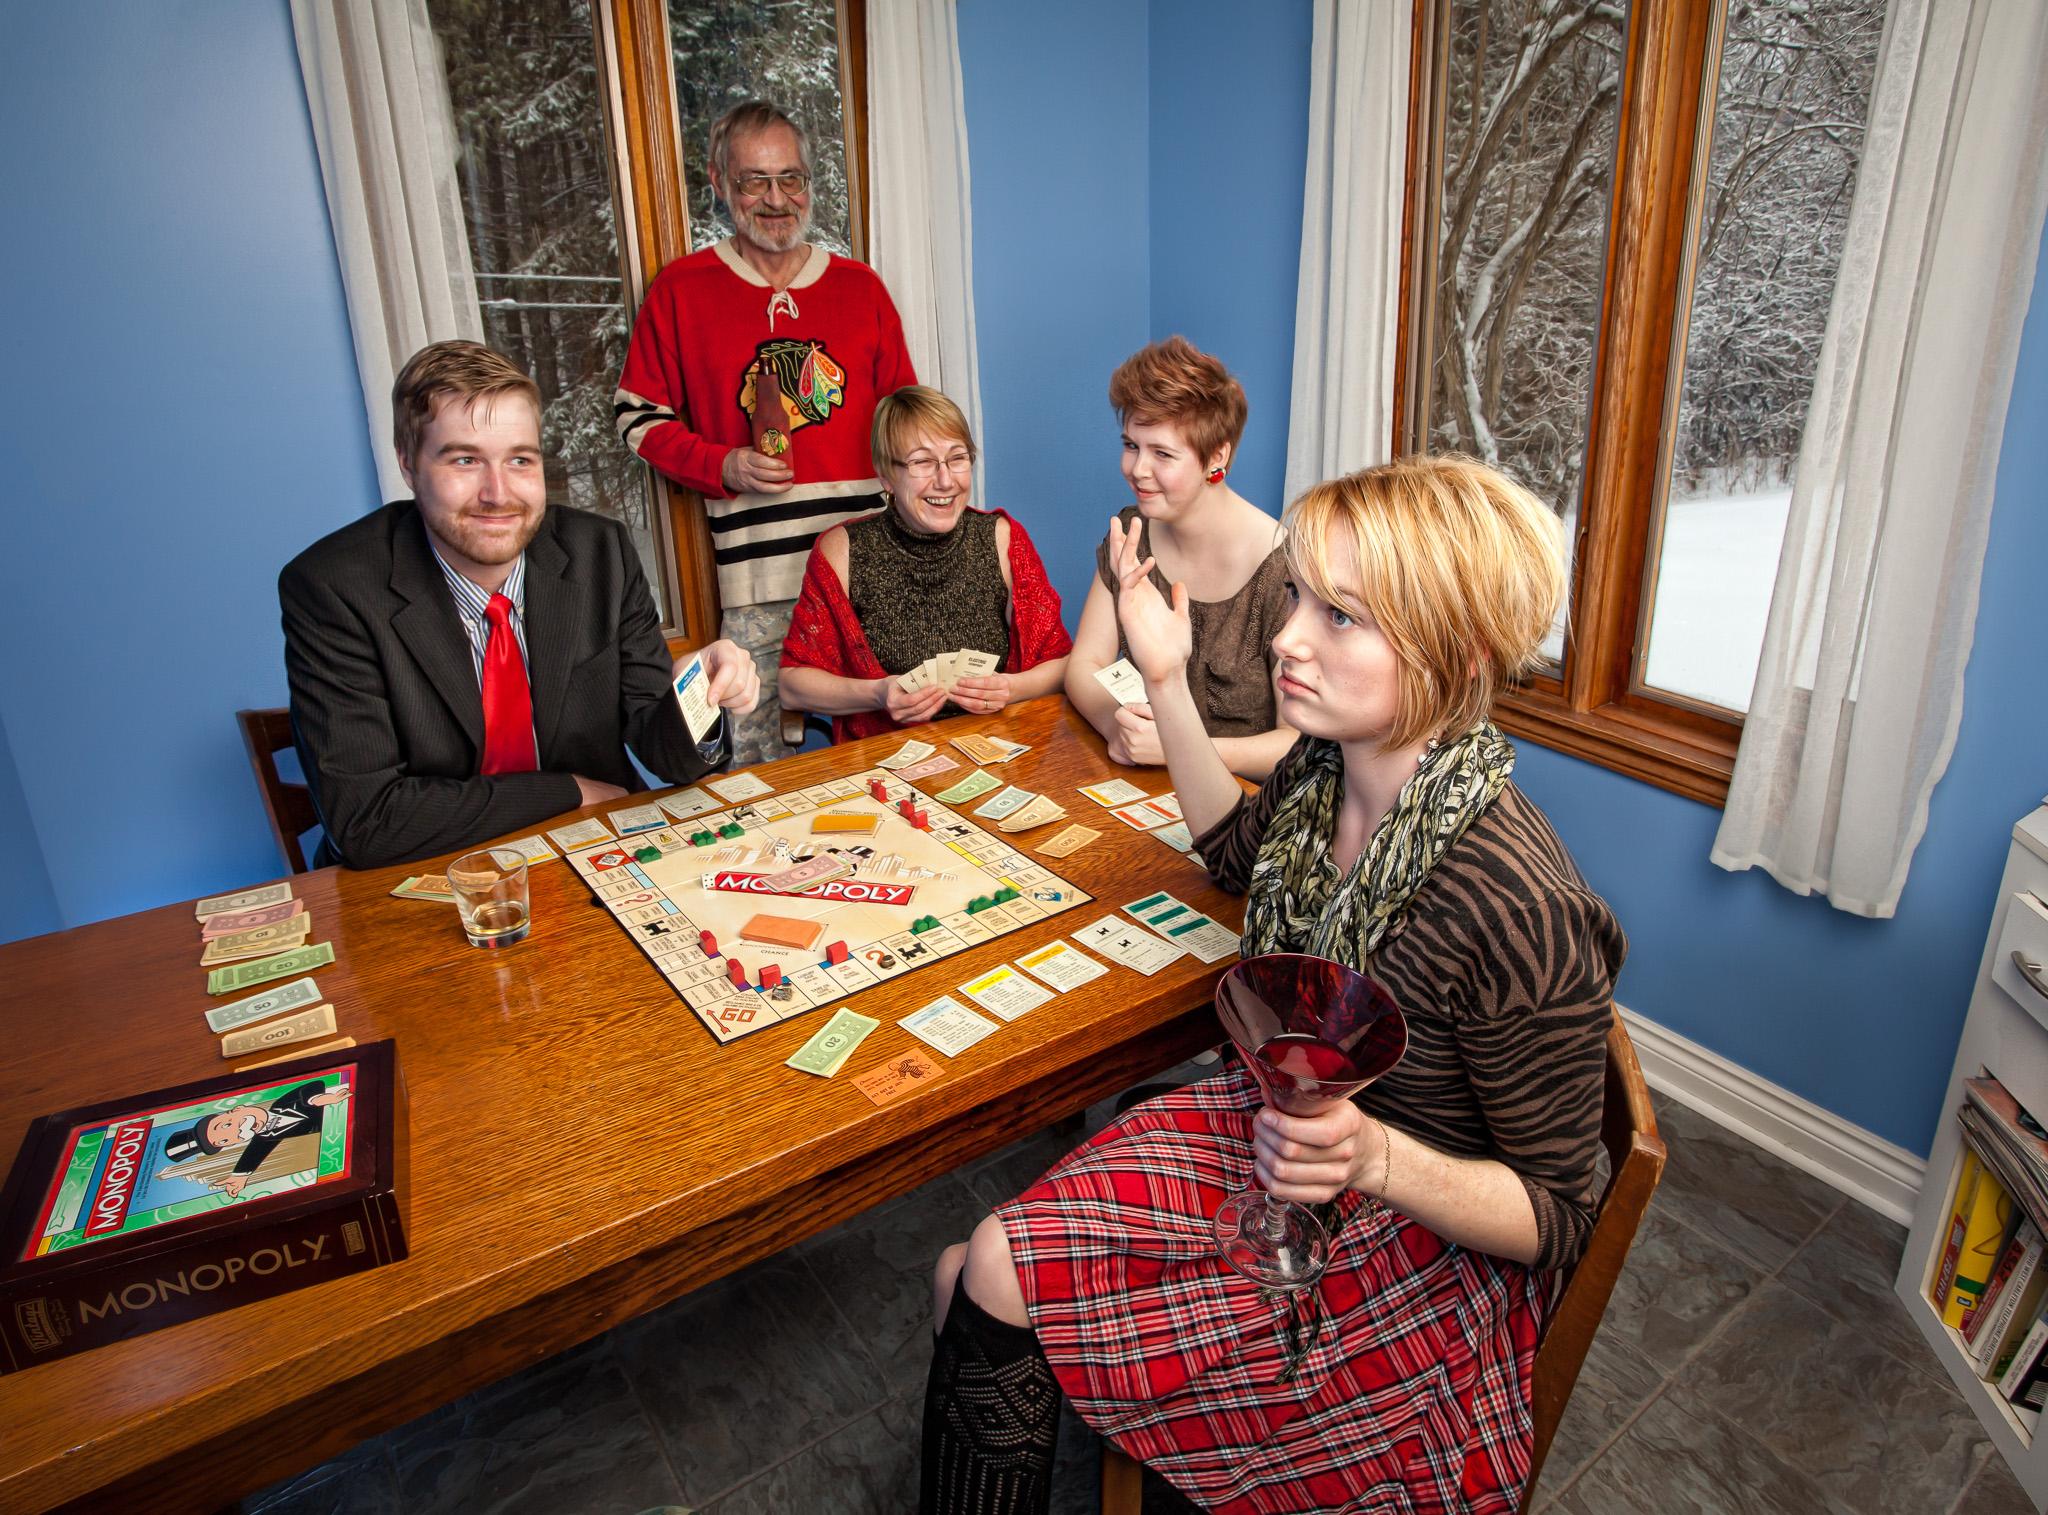 Ottawa Extreme Family Photography - JVLphoto